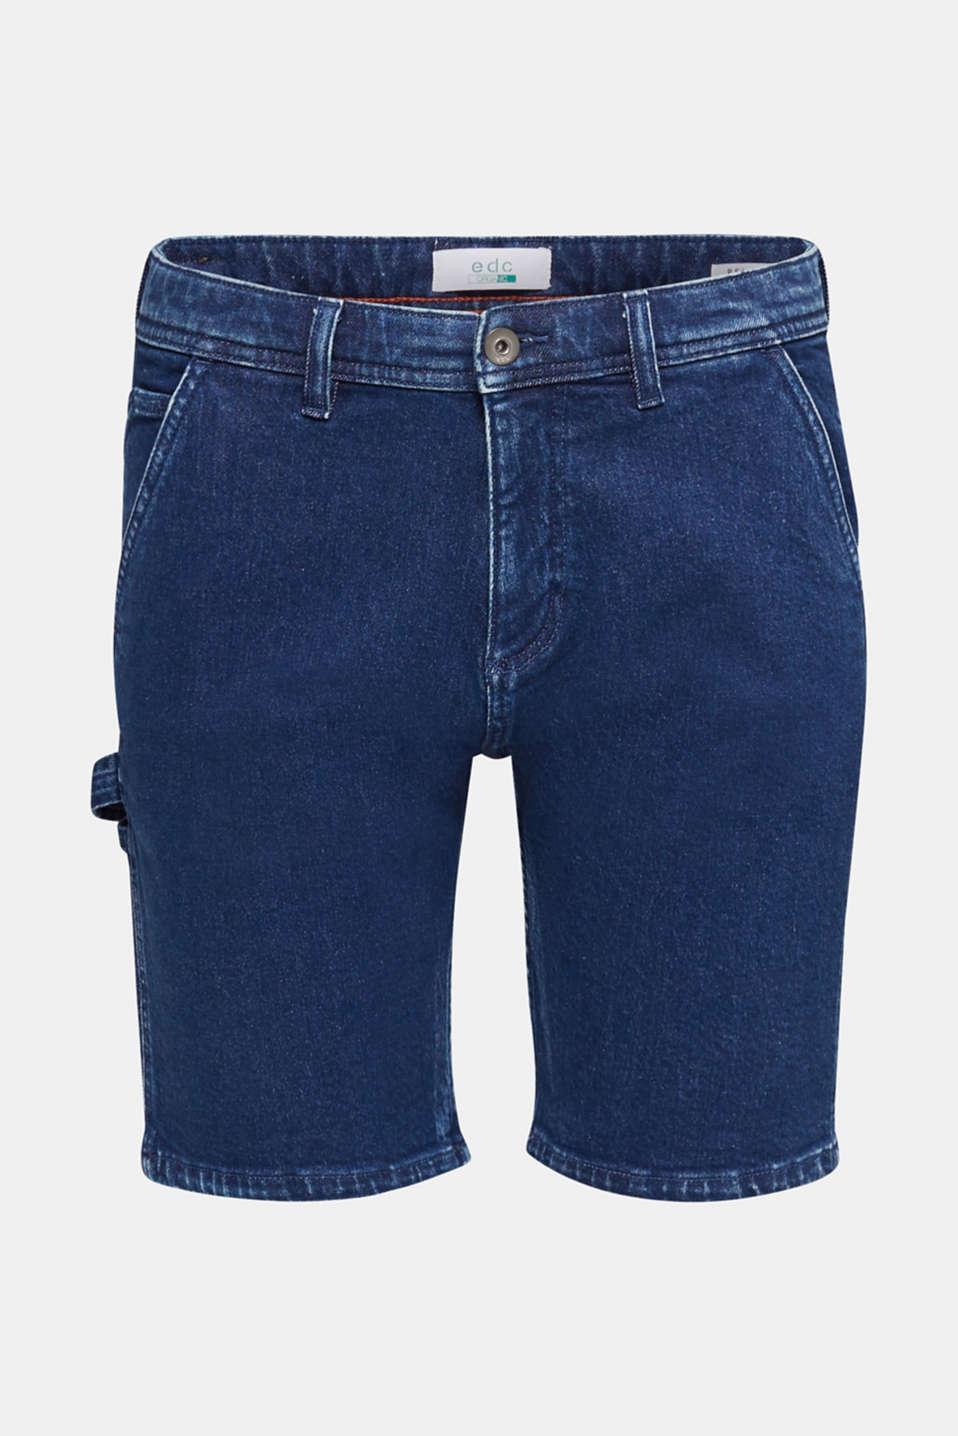 Denim shorts in a utility look, BLUE DARK WASH, detail image number 5